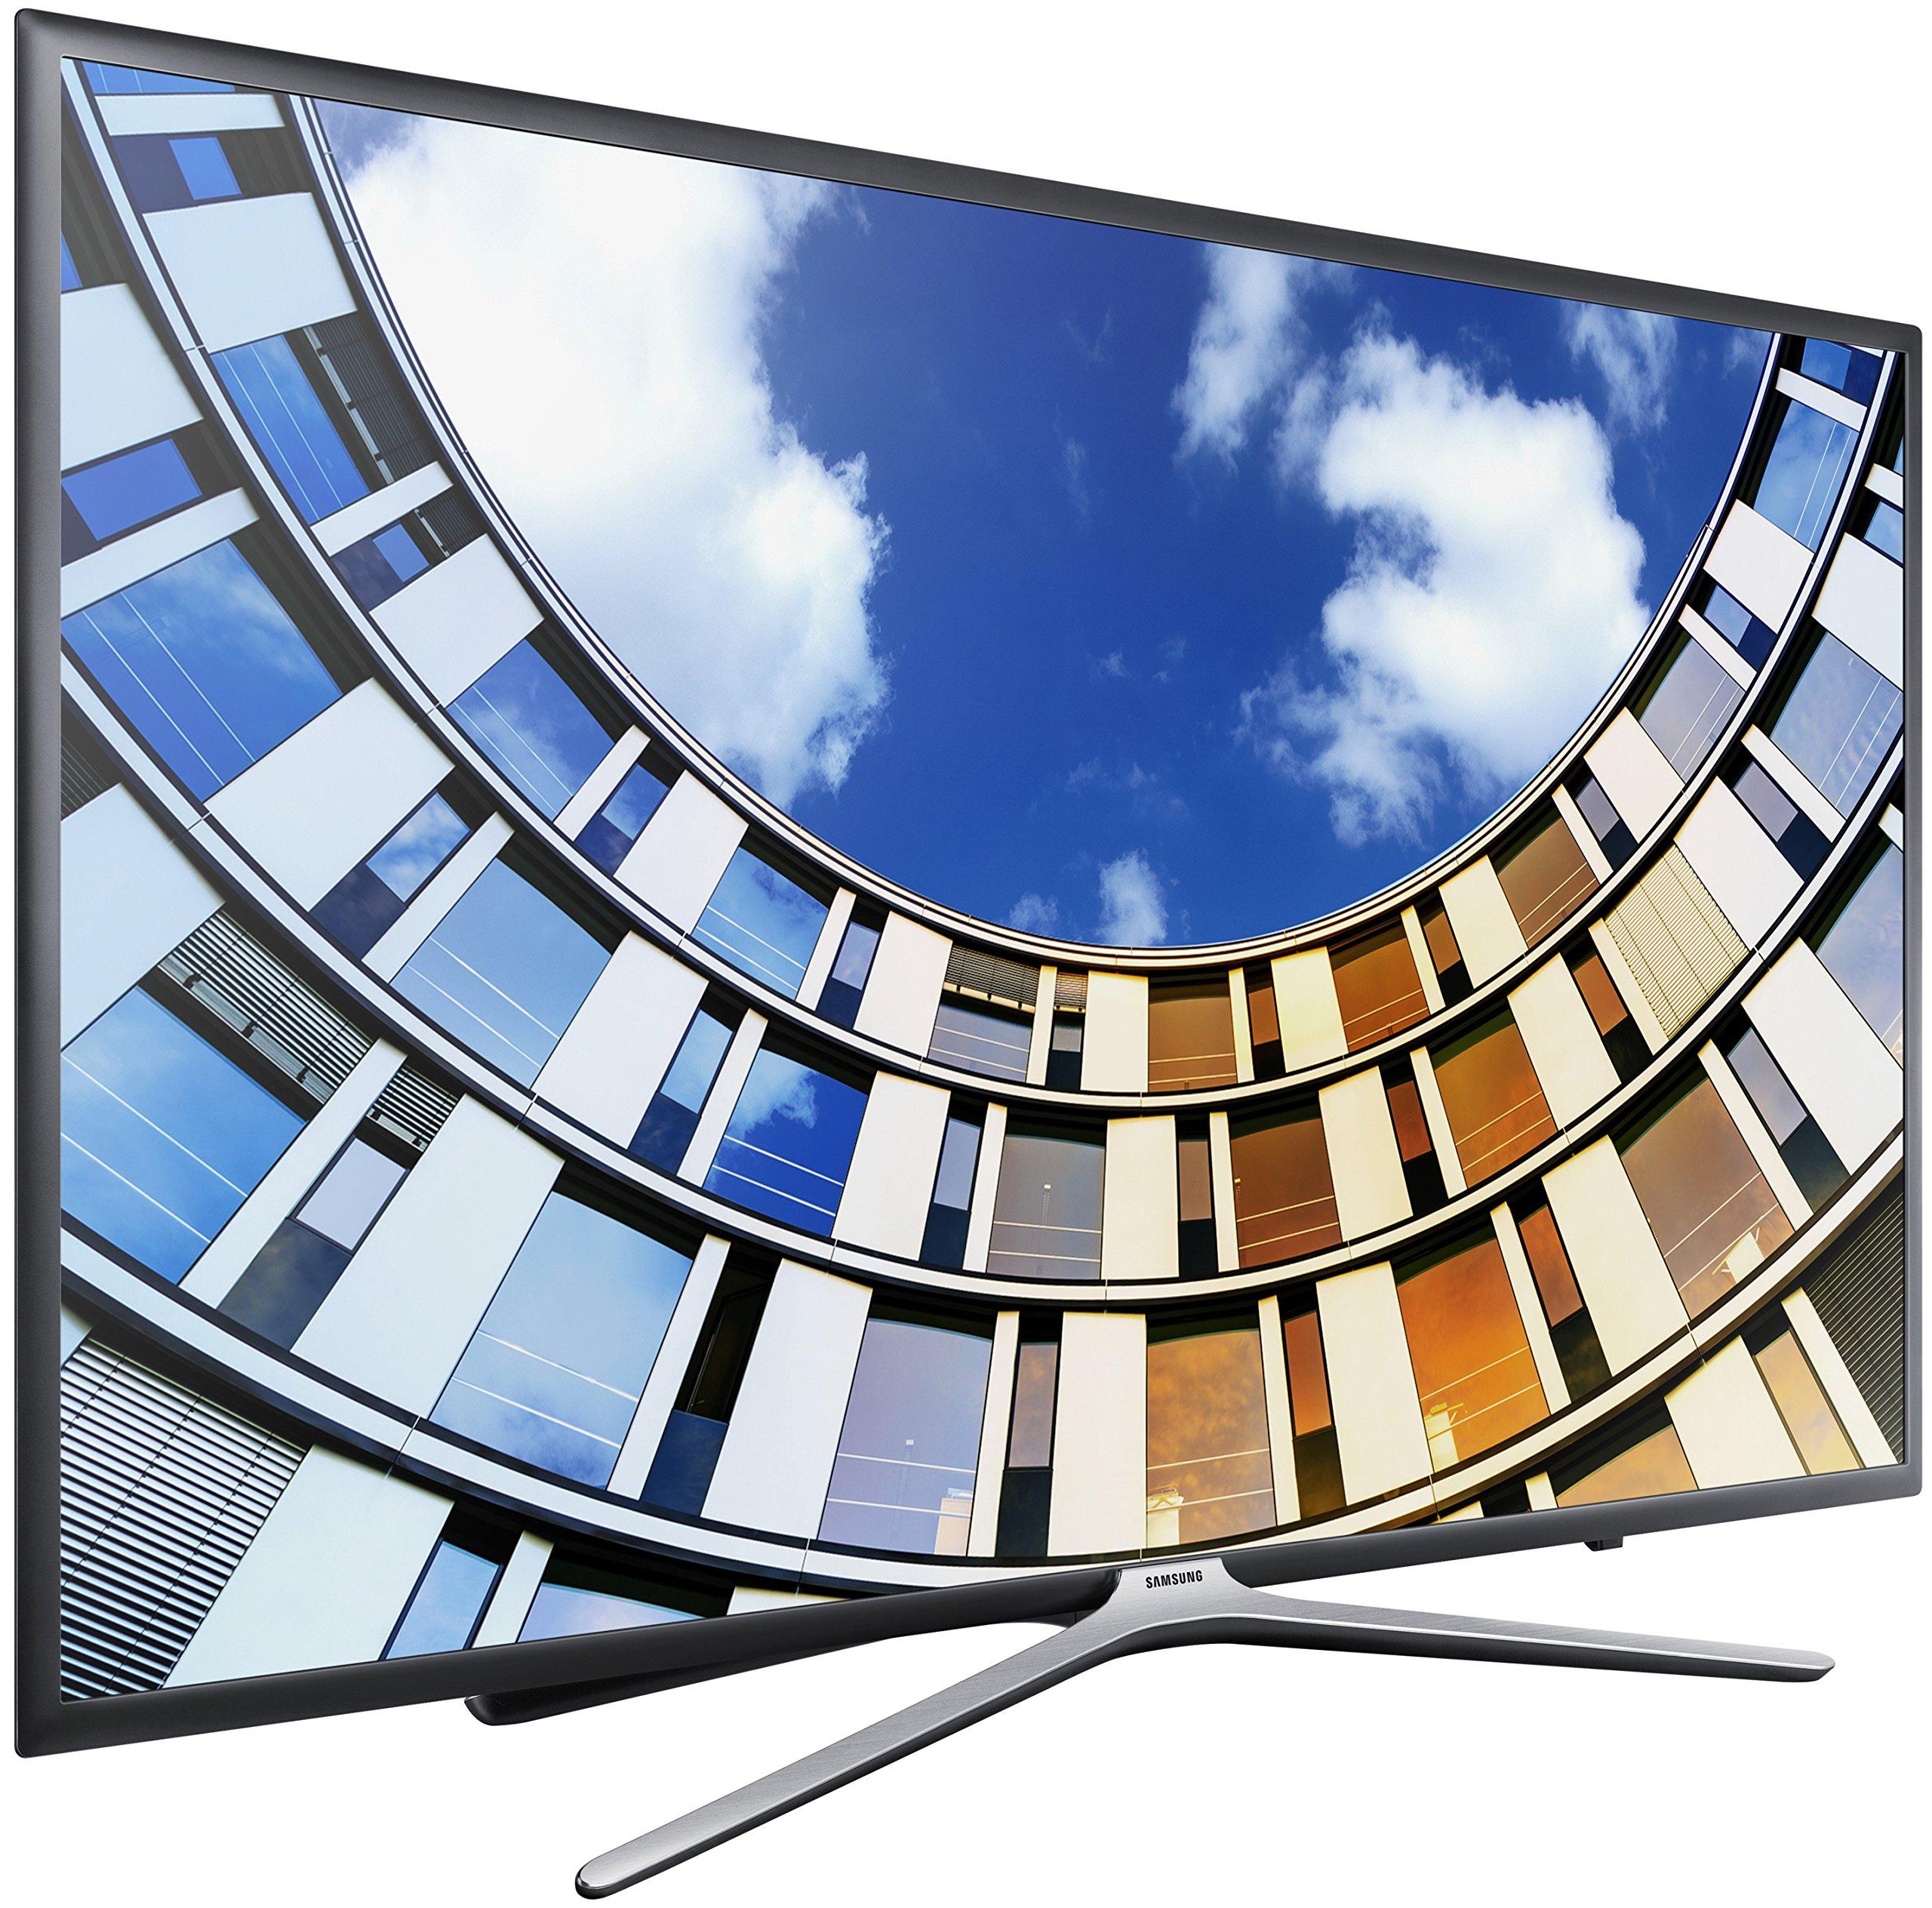 Samsung m5570 televisor (Full HD, sintonizador analógico, Smart TV ...